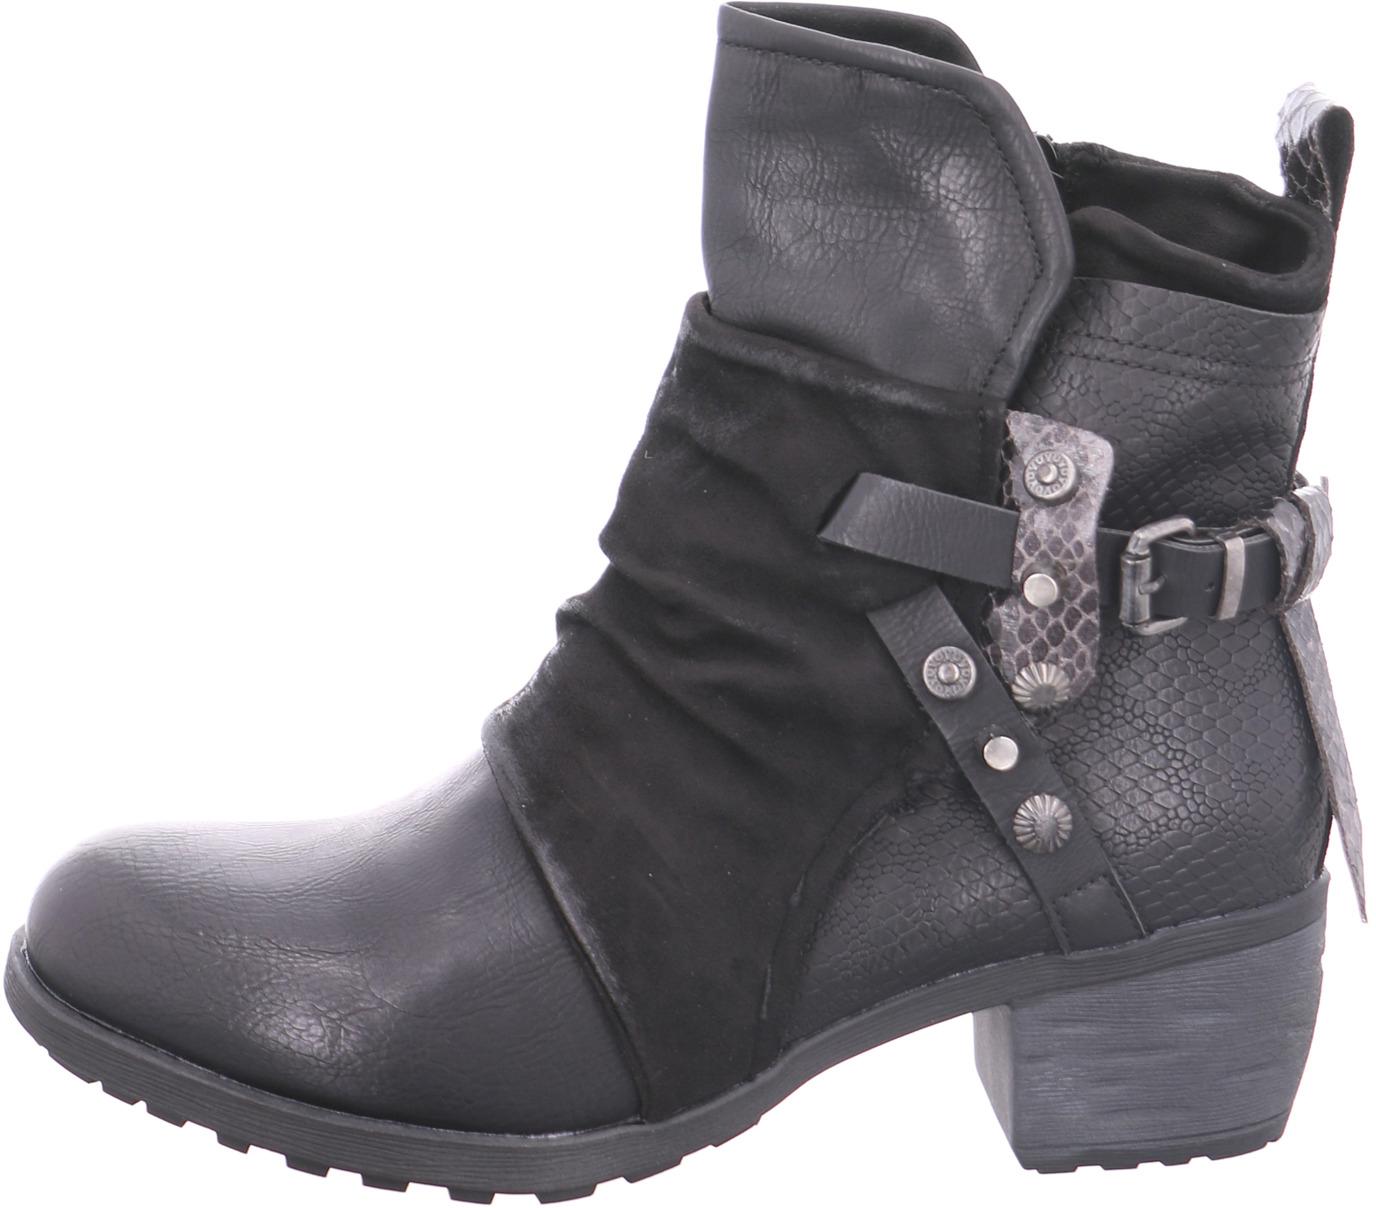 HW200904 Black